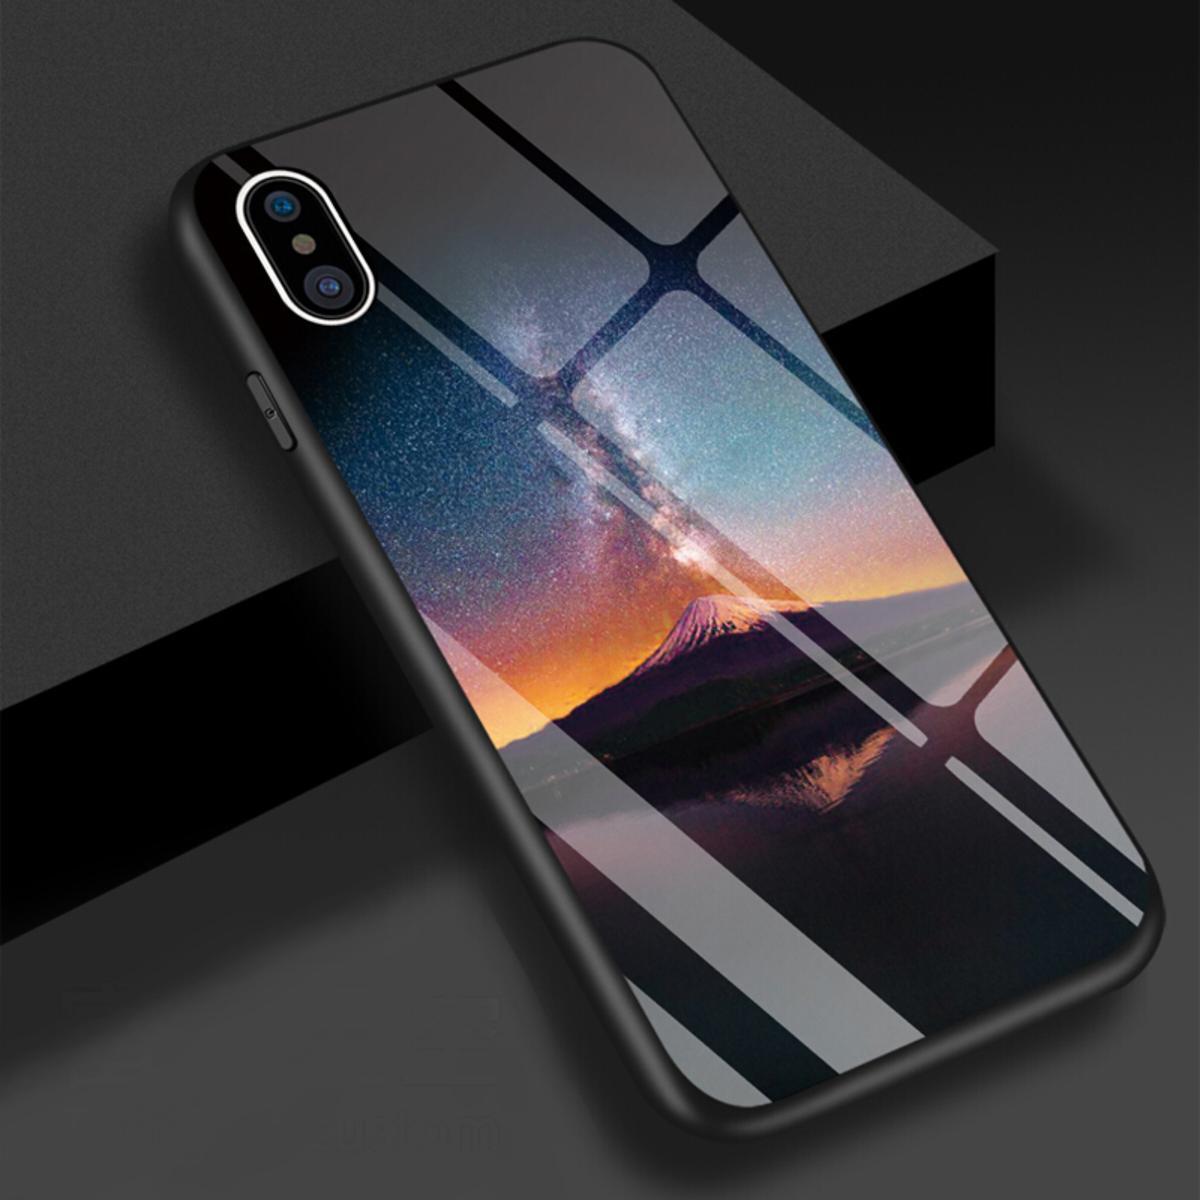 iPhone Xs Max 3D高防護鋼化玻璃外殼 (富士星空)